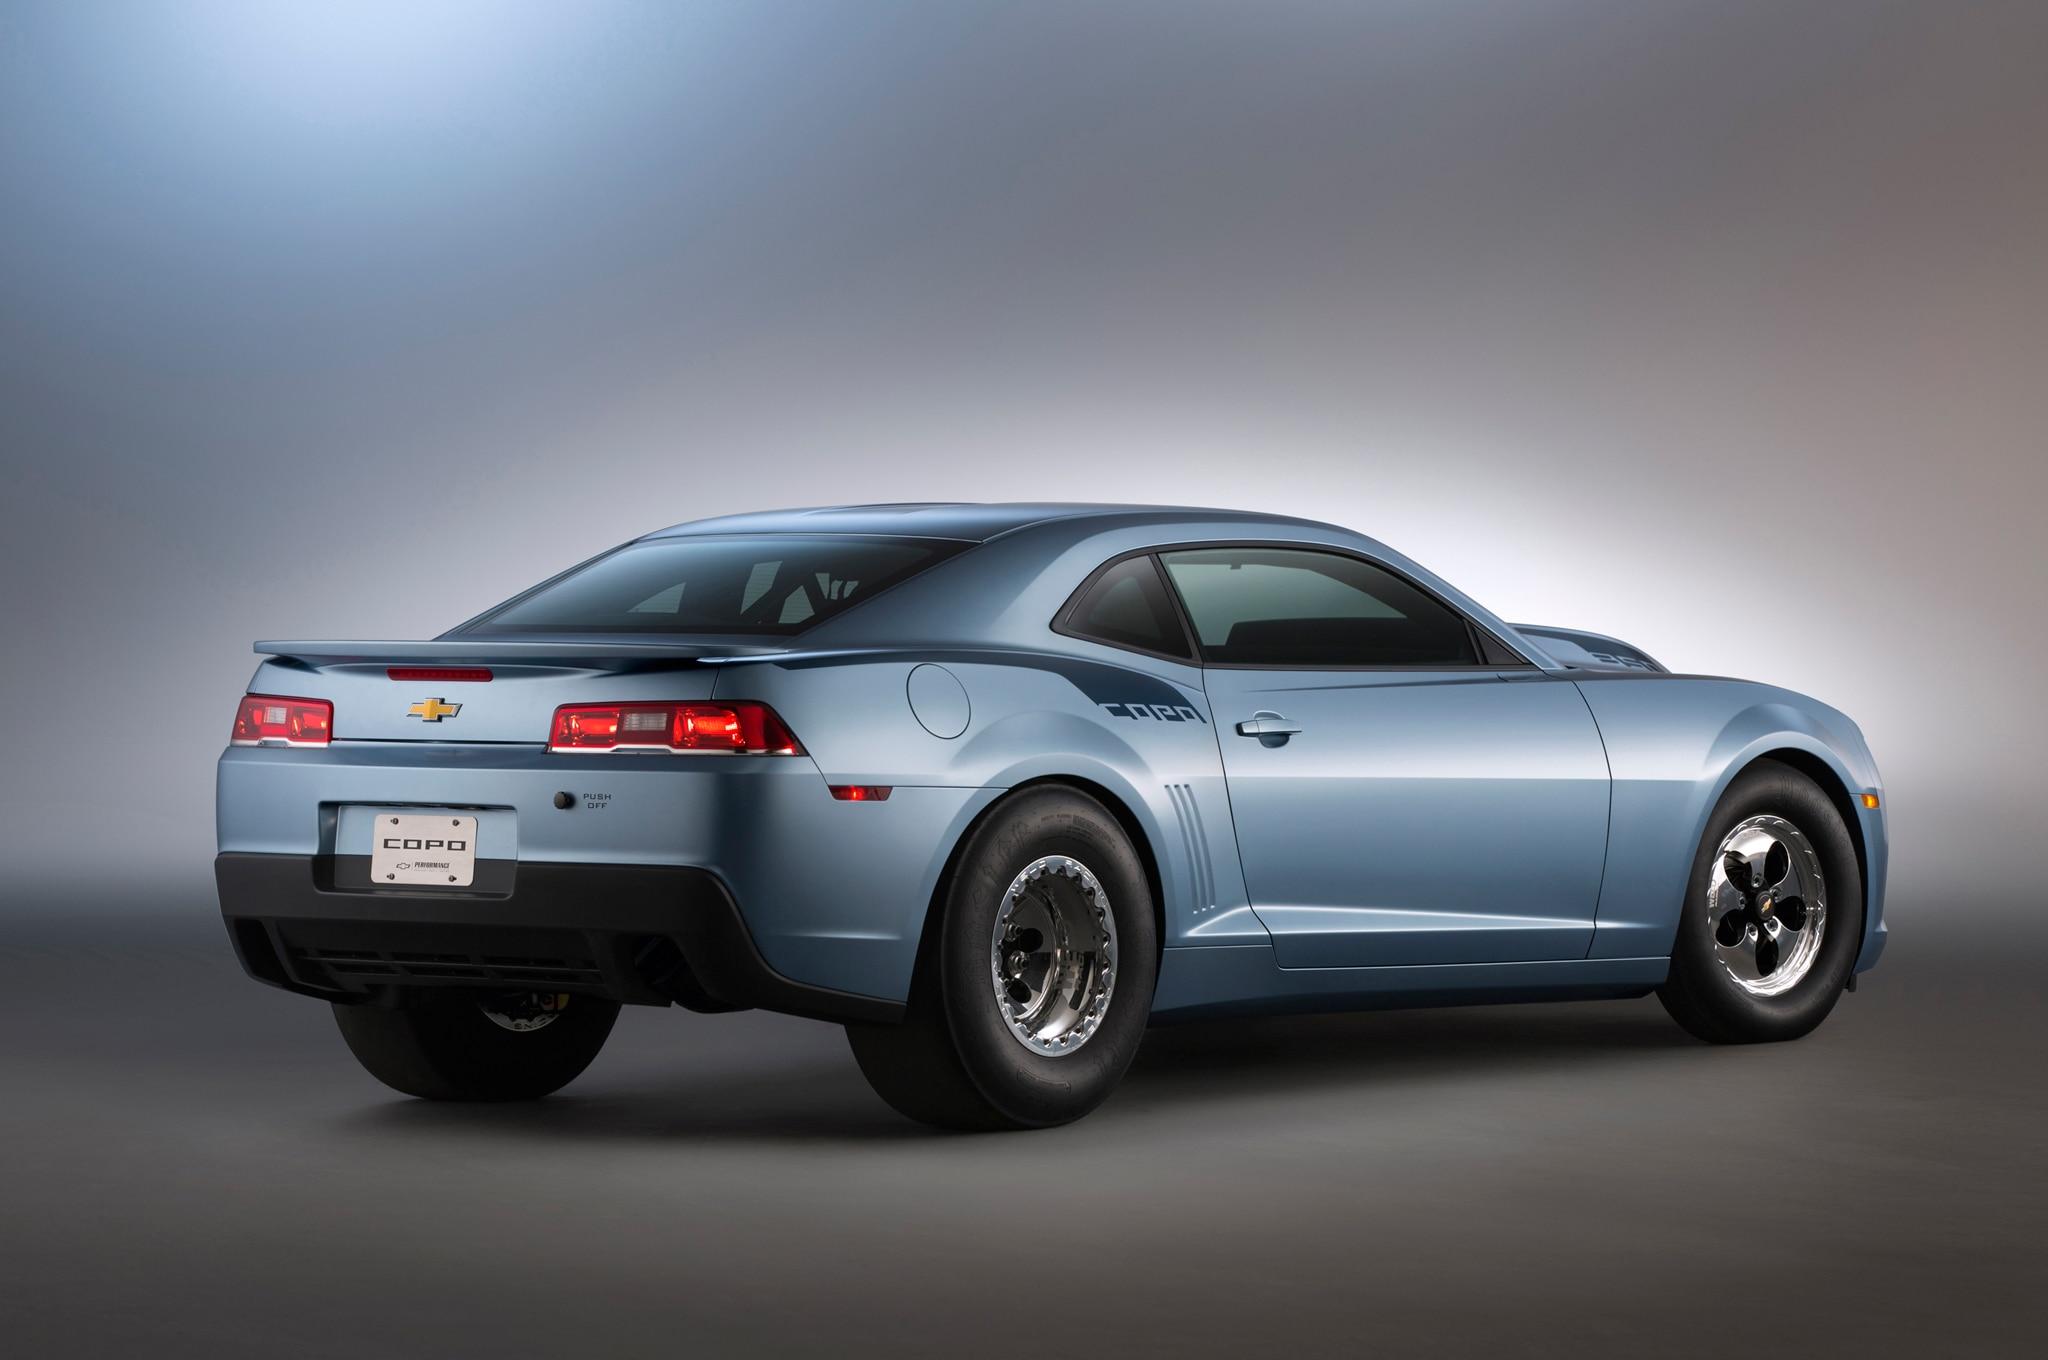 2014 Chevrolet Copo Camaro Rear Angle